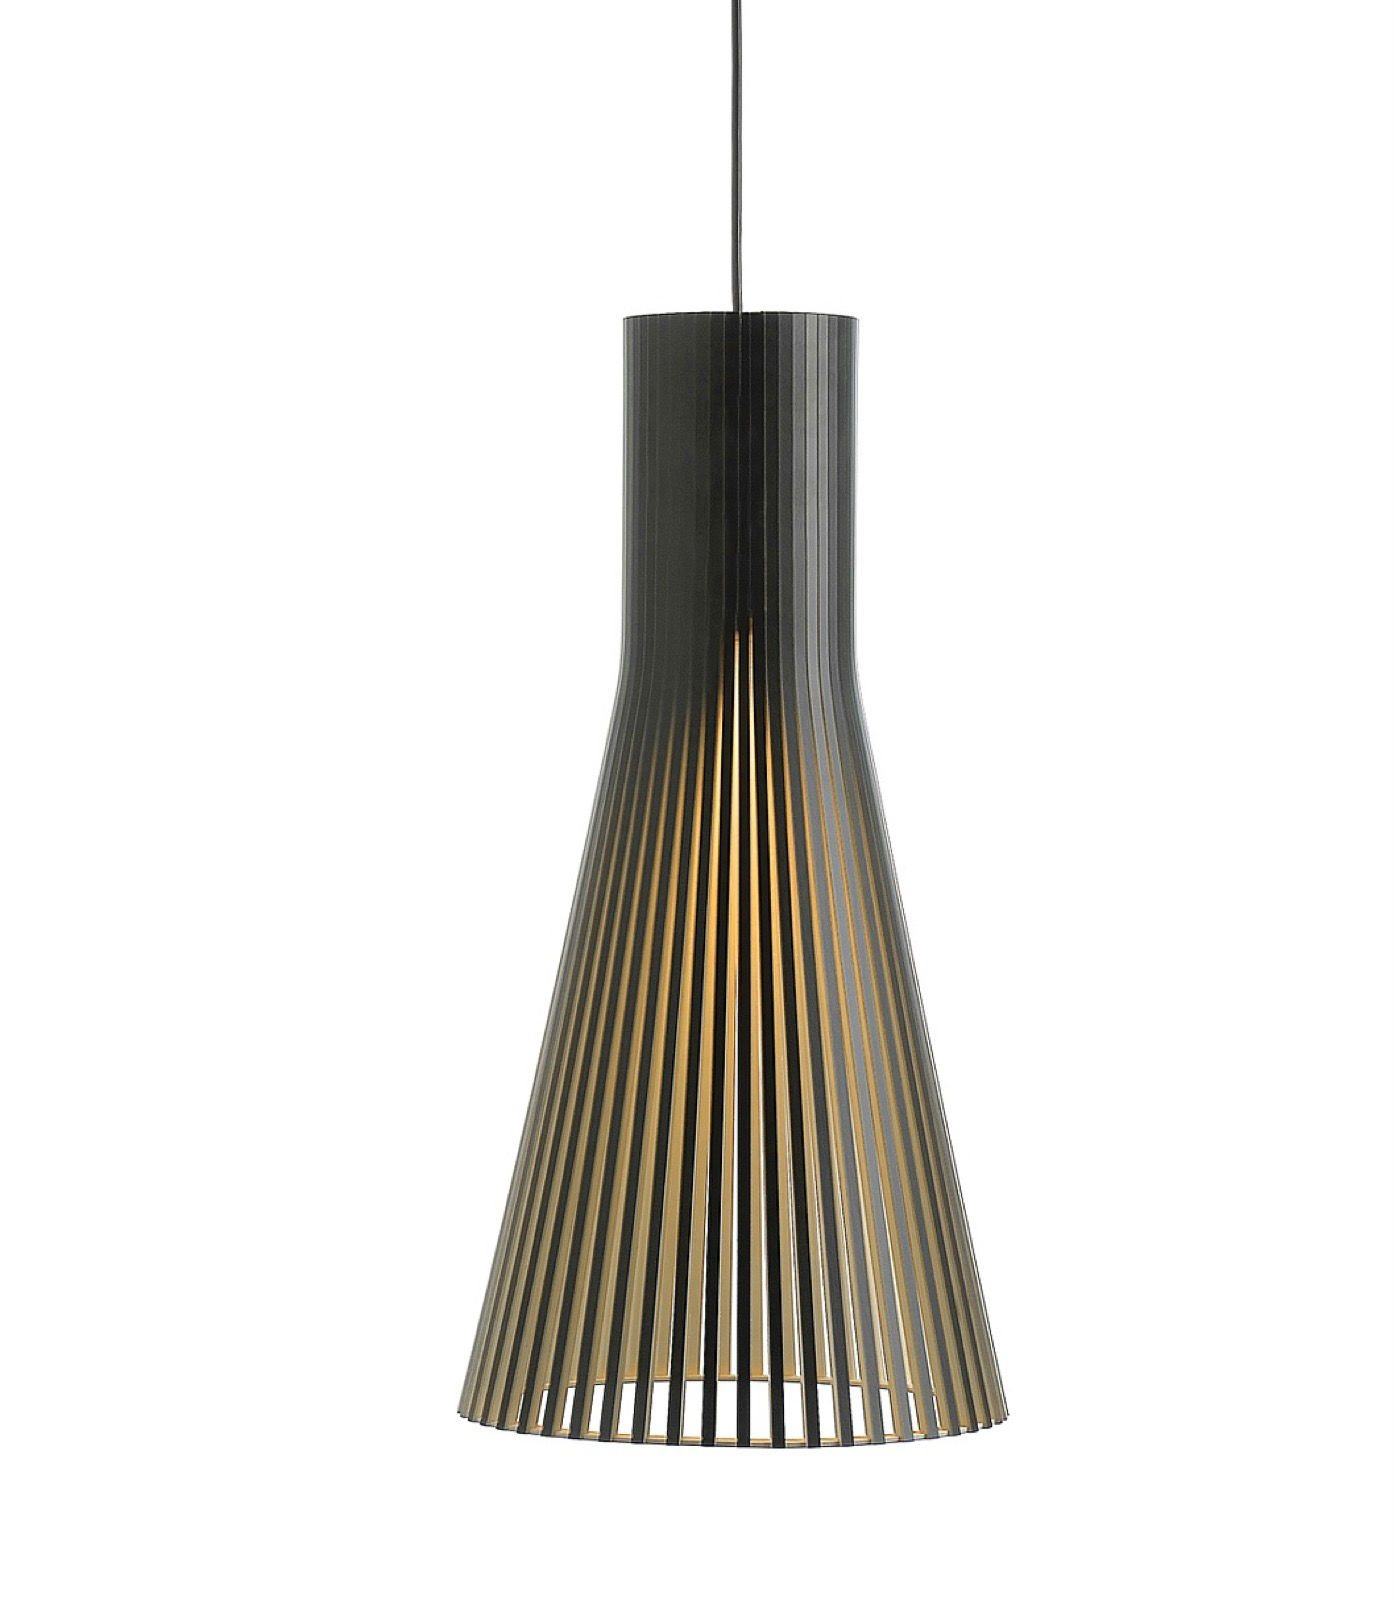 Secto Secto 4200 hanglamp | Matser Wageningen